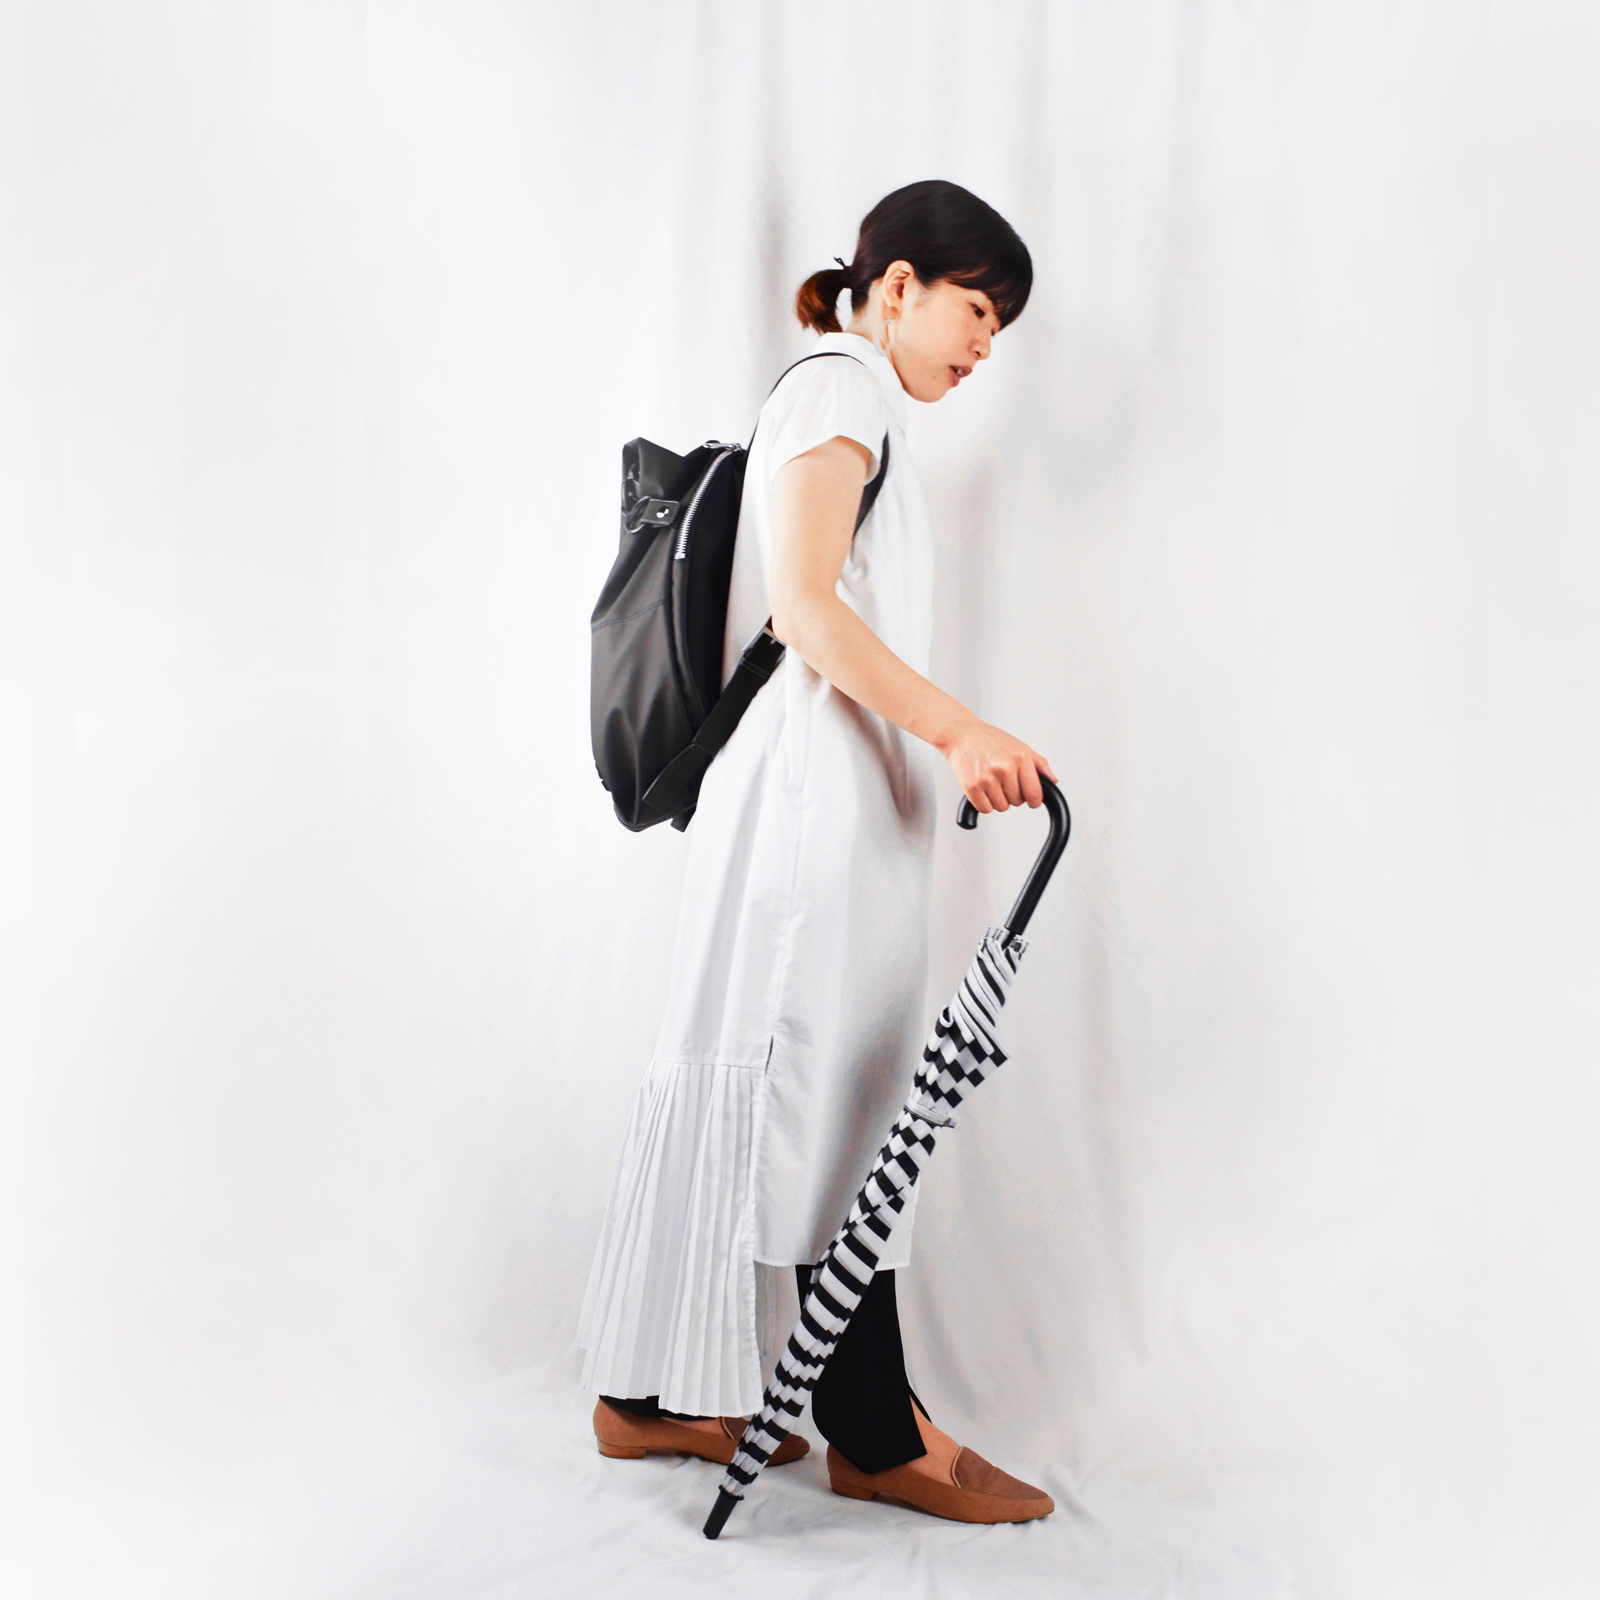 【Rubber-cho】25bisリュック Mサイズ